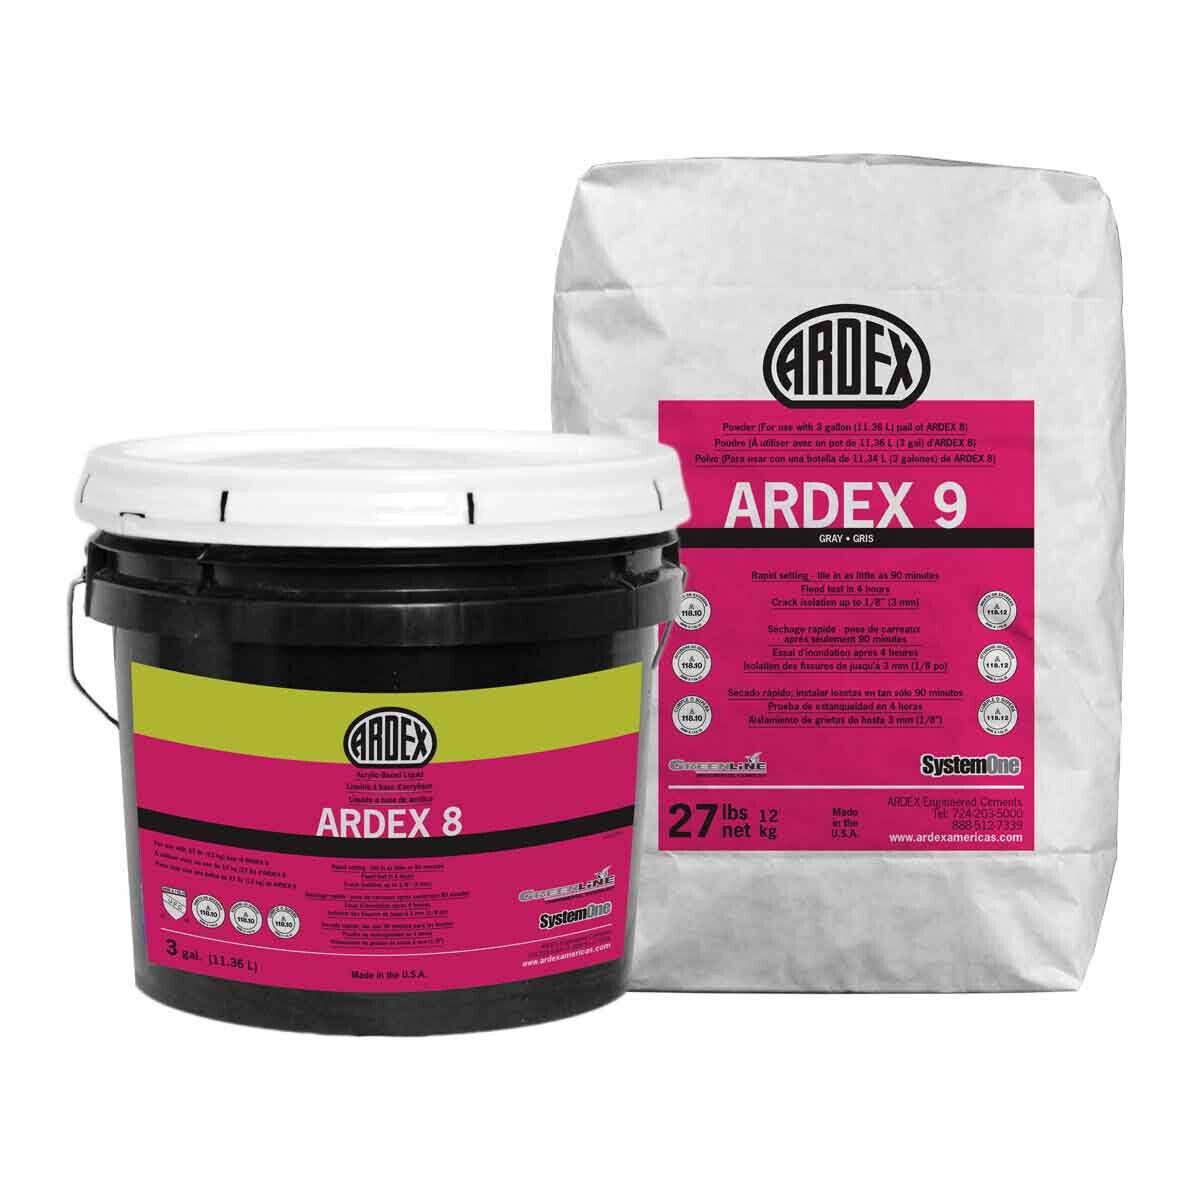 Ardex Waterproof Crack Isolation